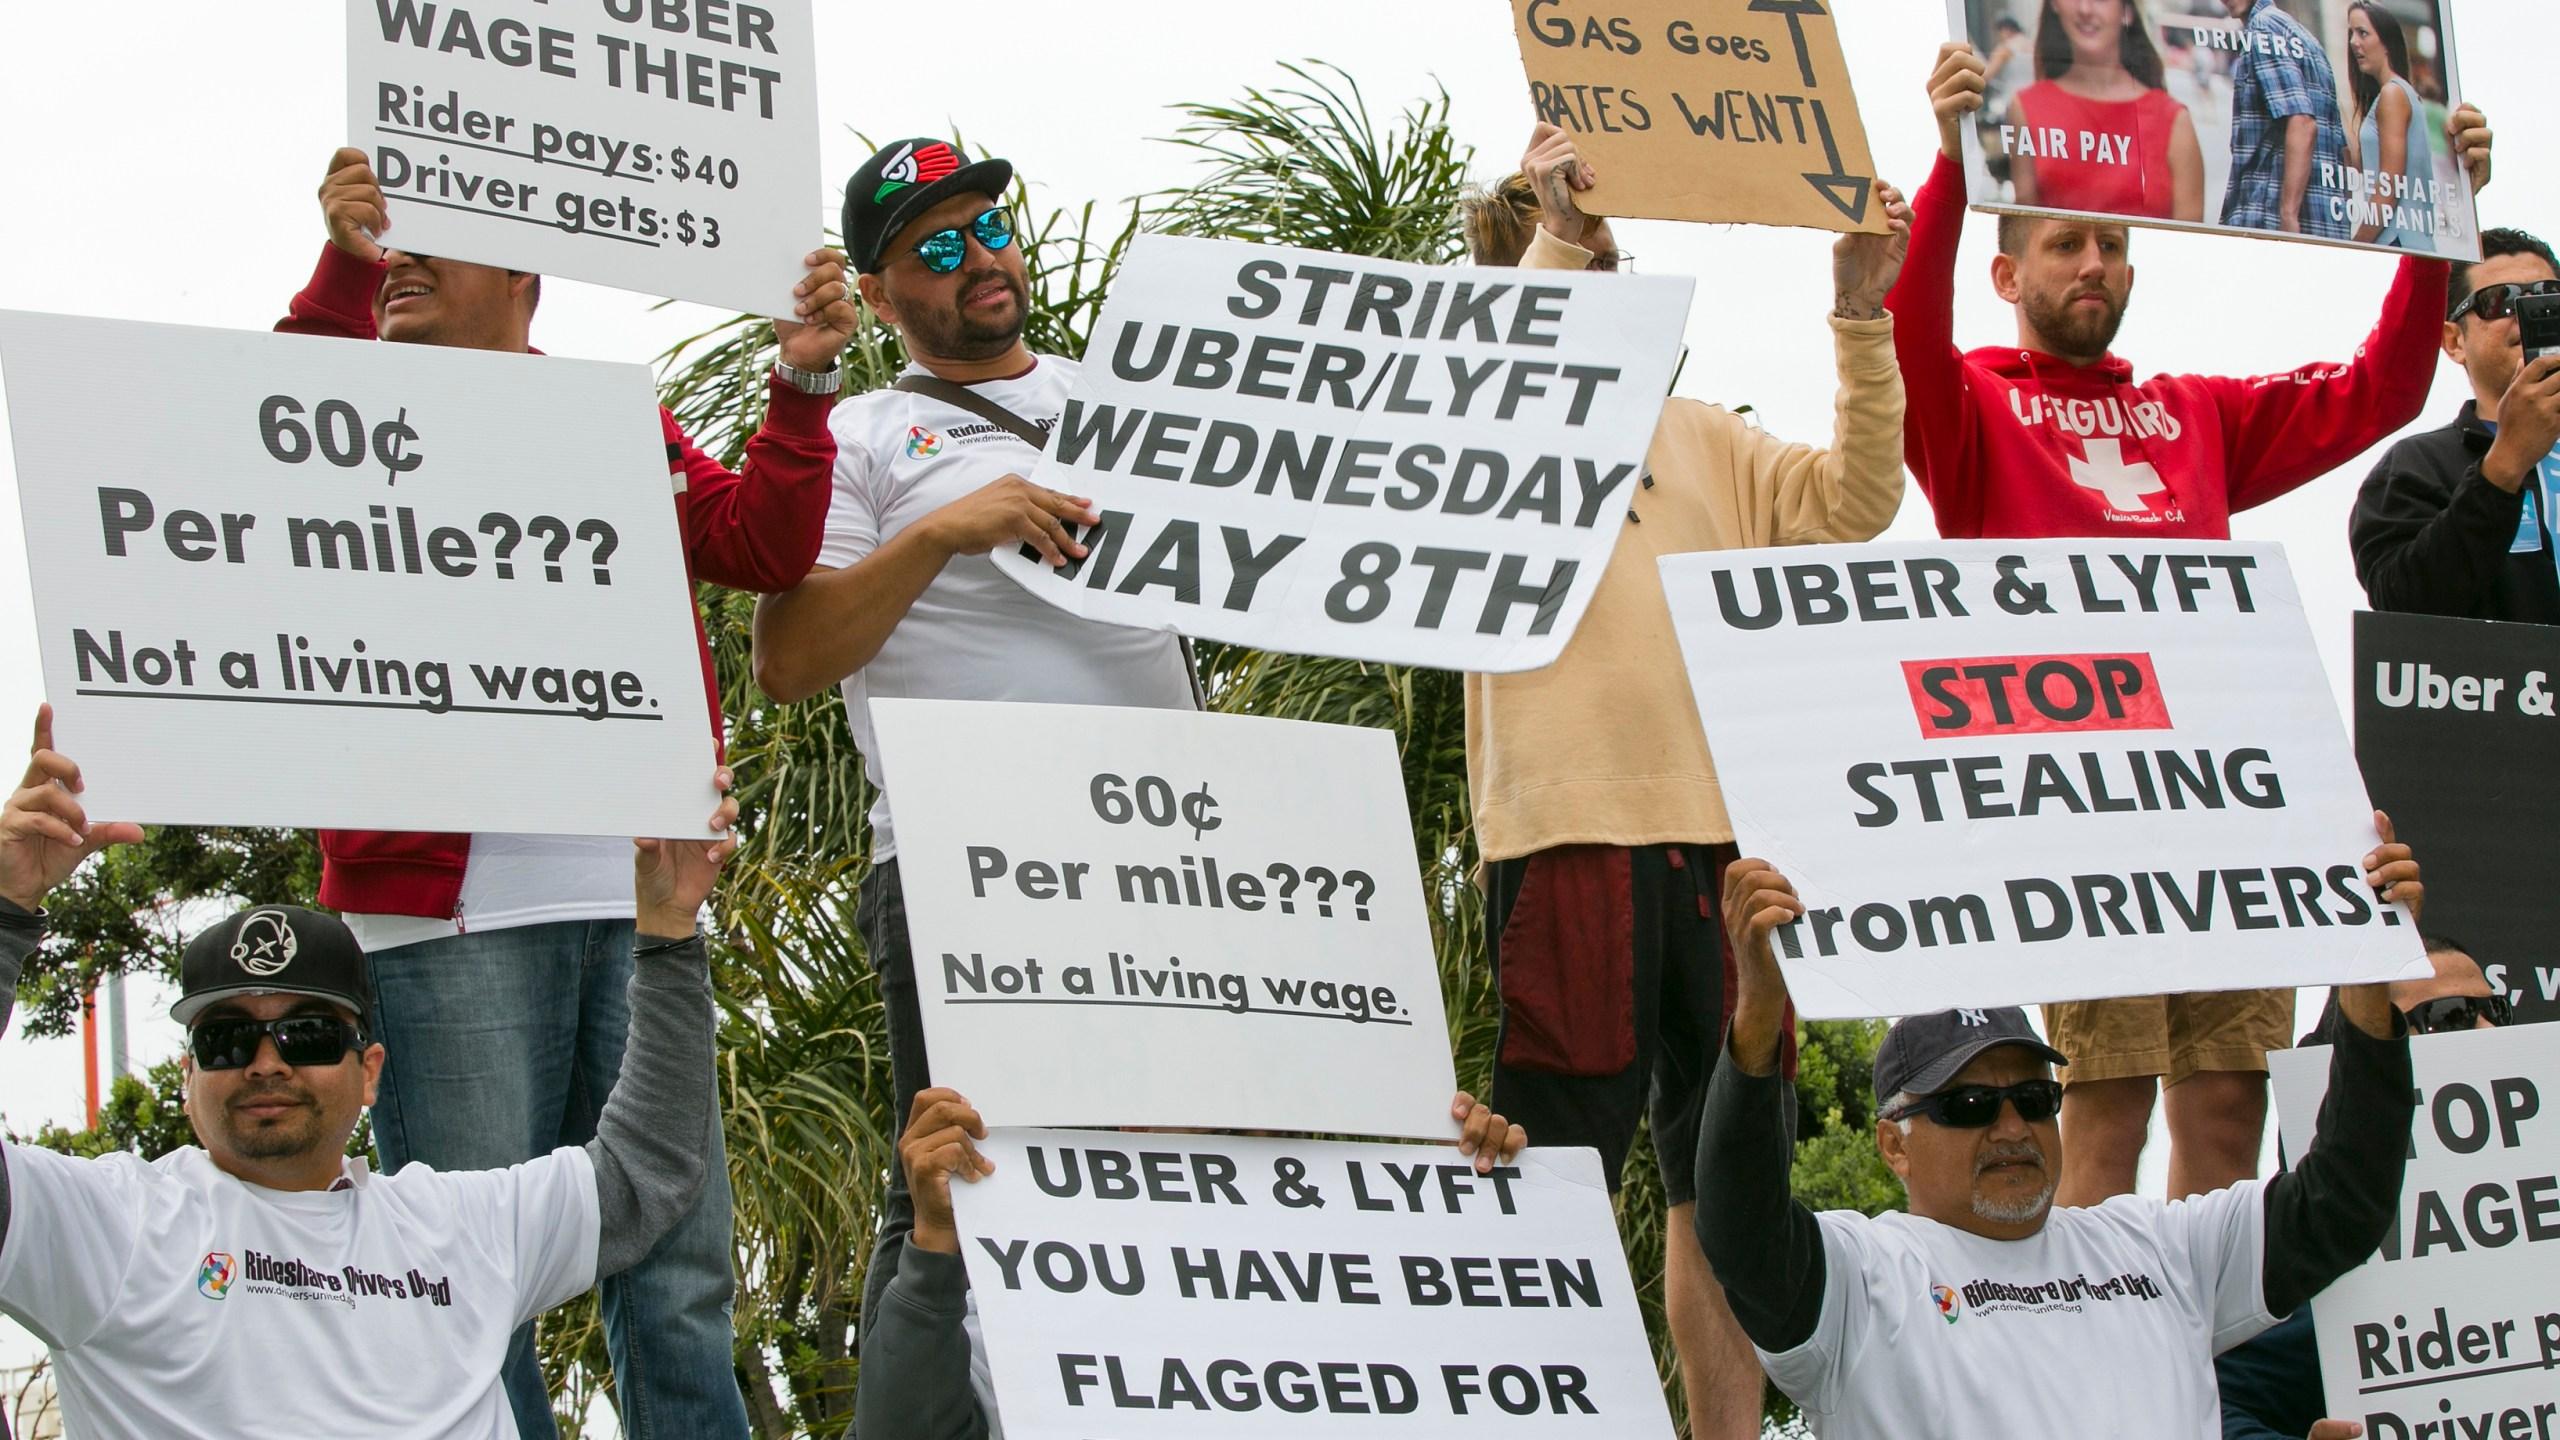 Uber_Lyft_Strike_05470-159532.jpg02277595